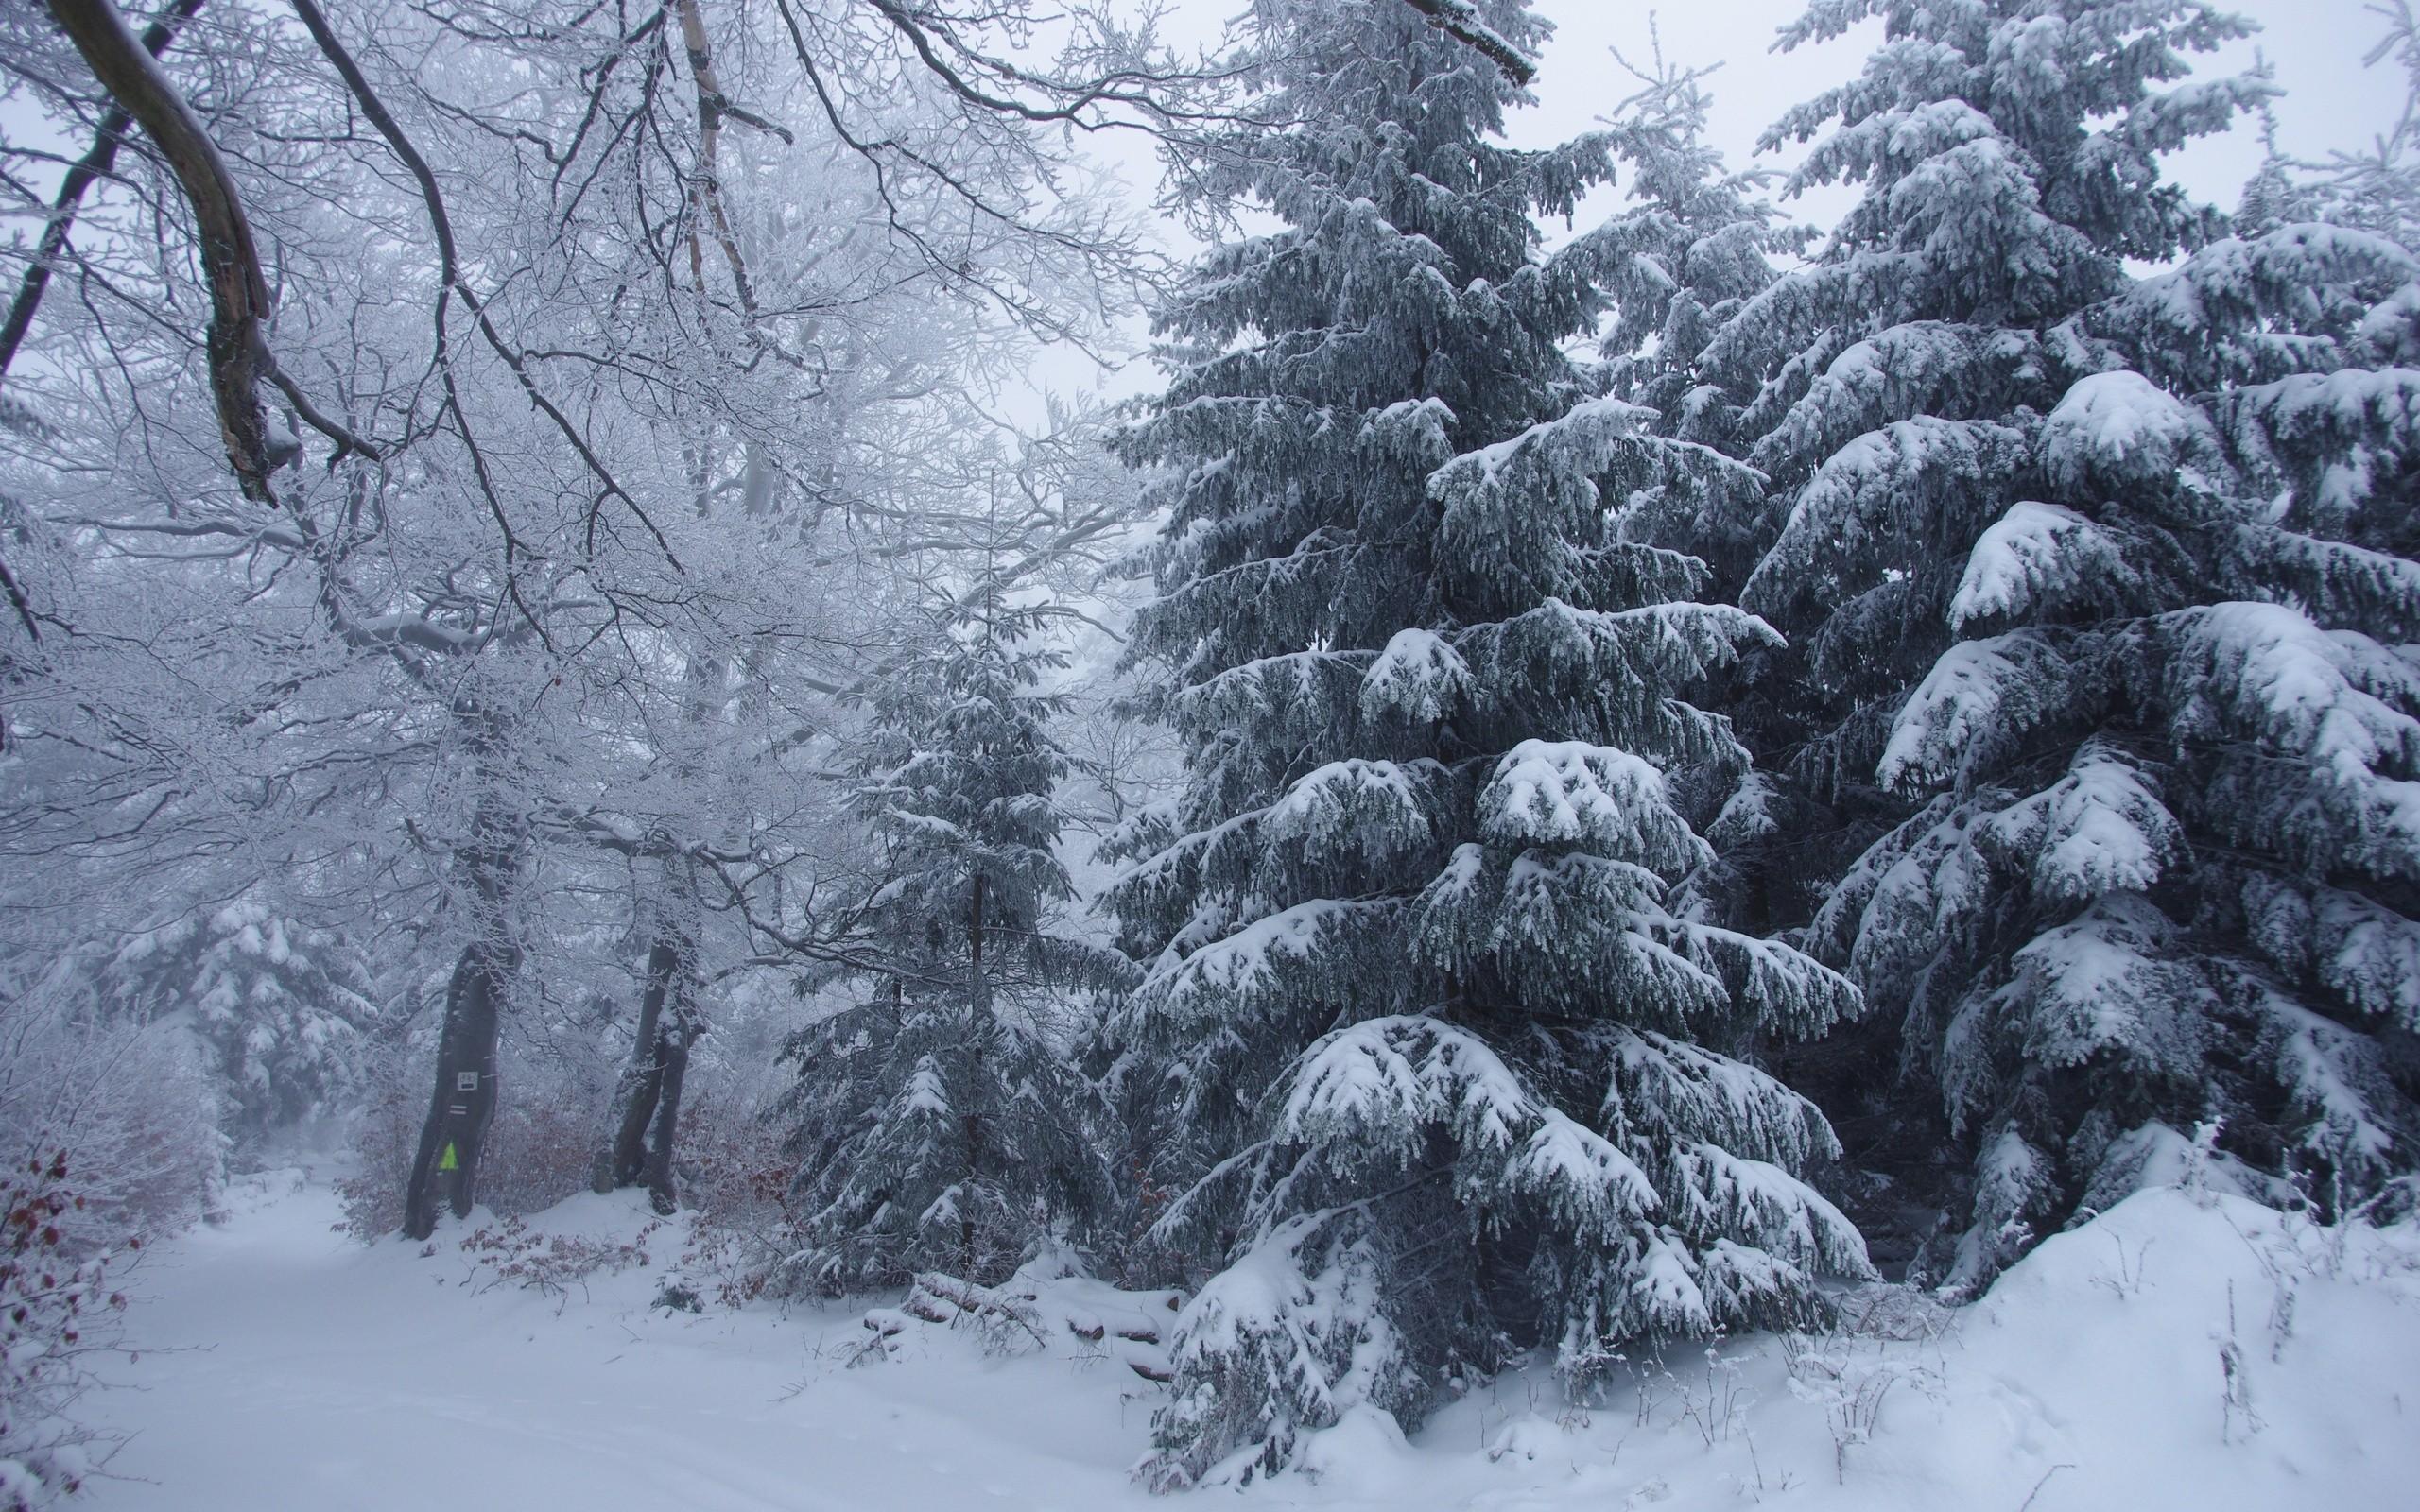 Download Wallpaper 2560×1024 Winter, Forest, Landscape Dual .